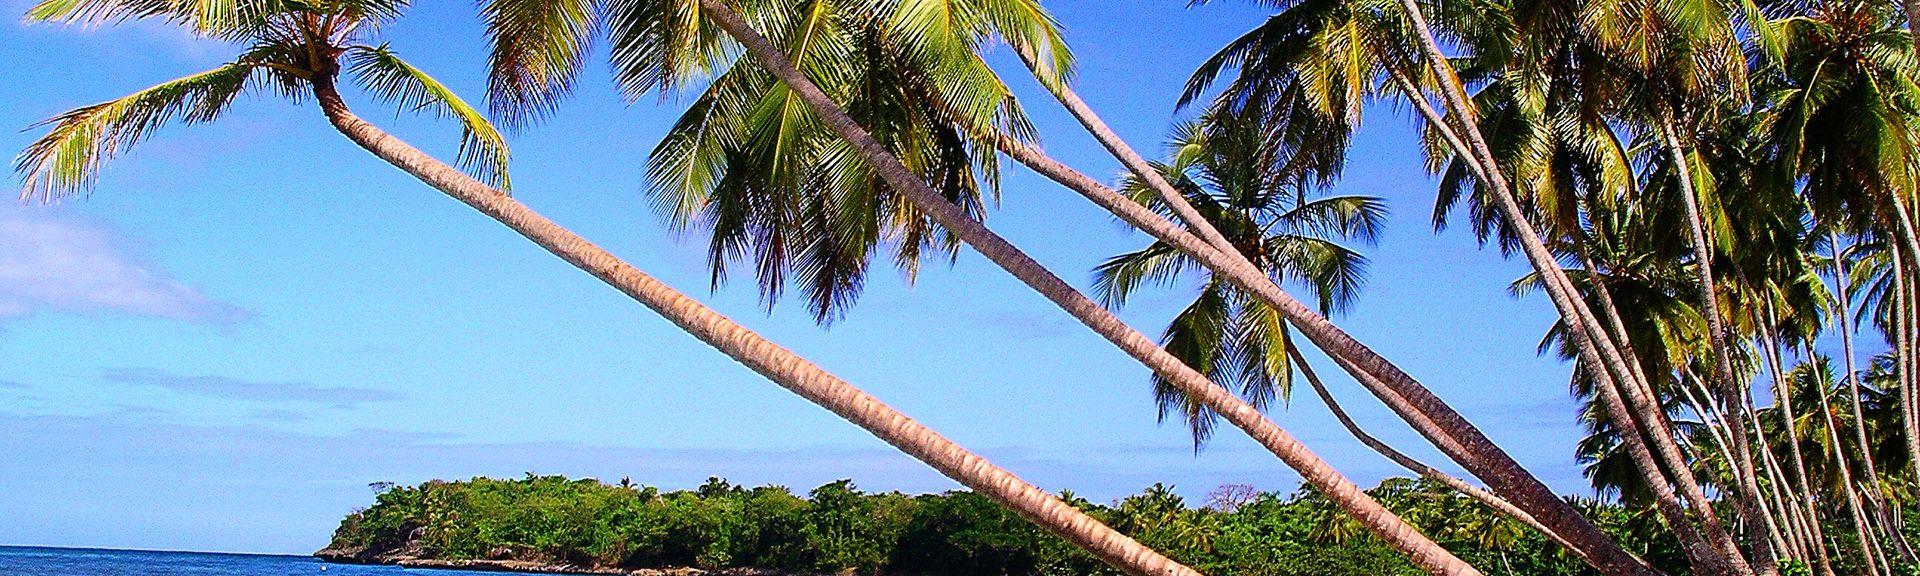 Bas Vent, Deshaies, Basse-Terre, Guadeloupe